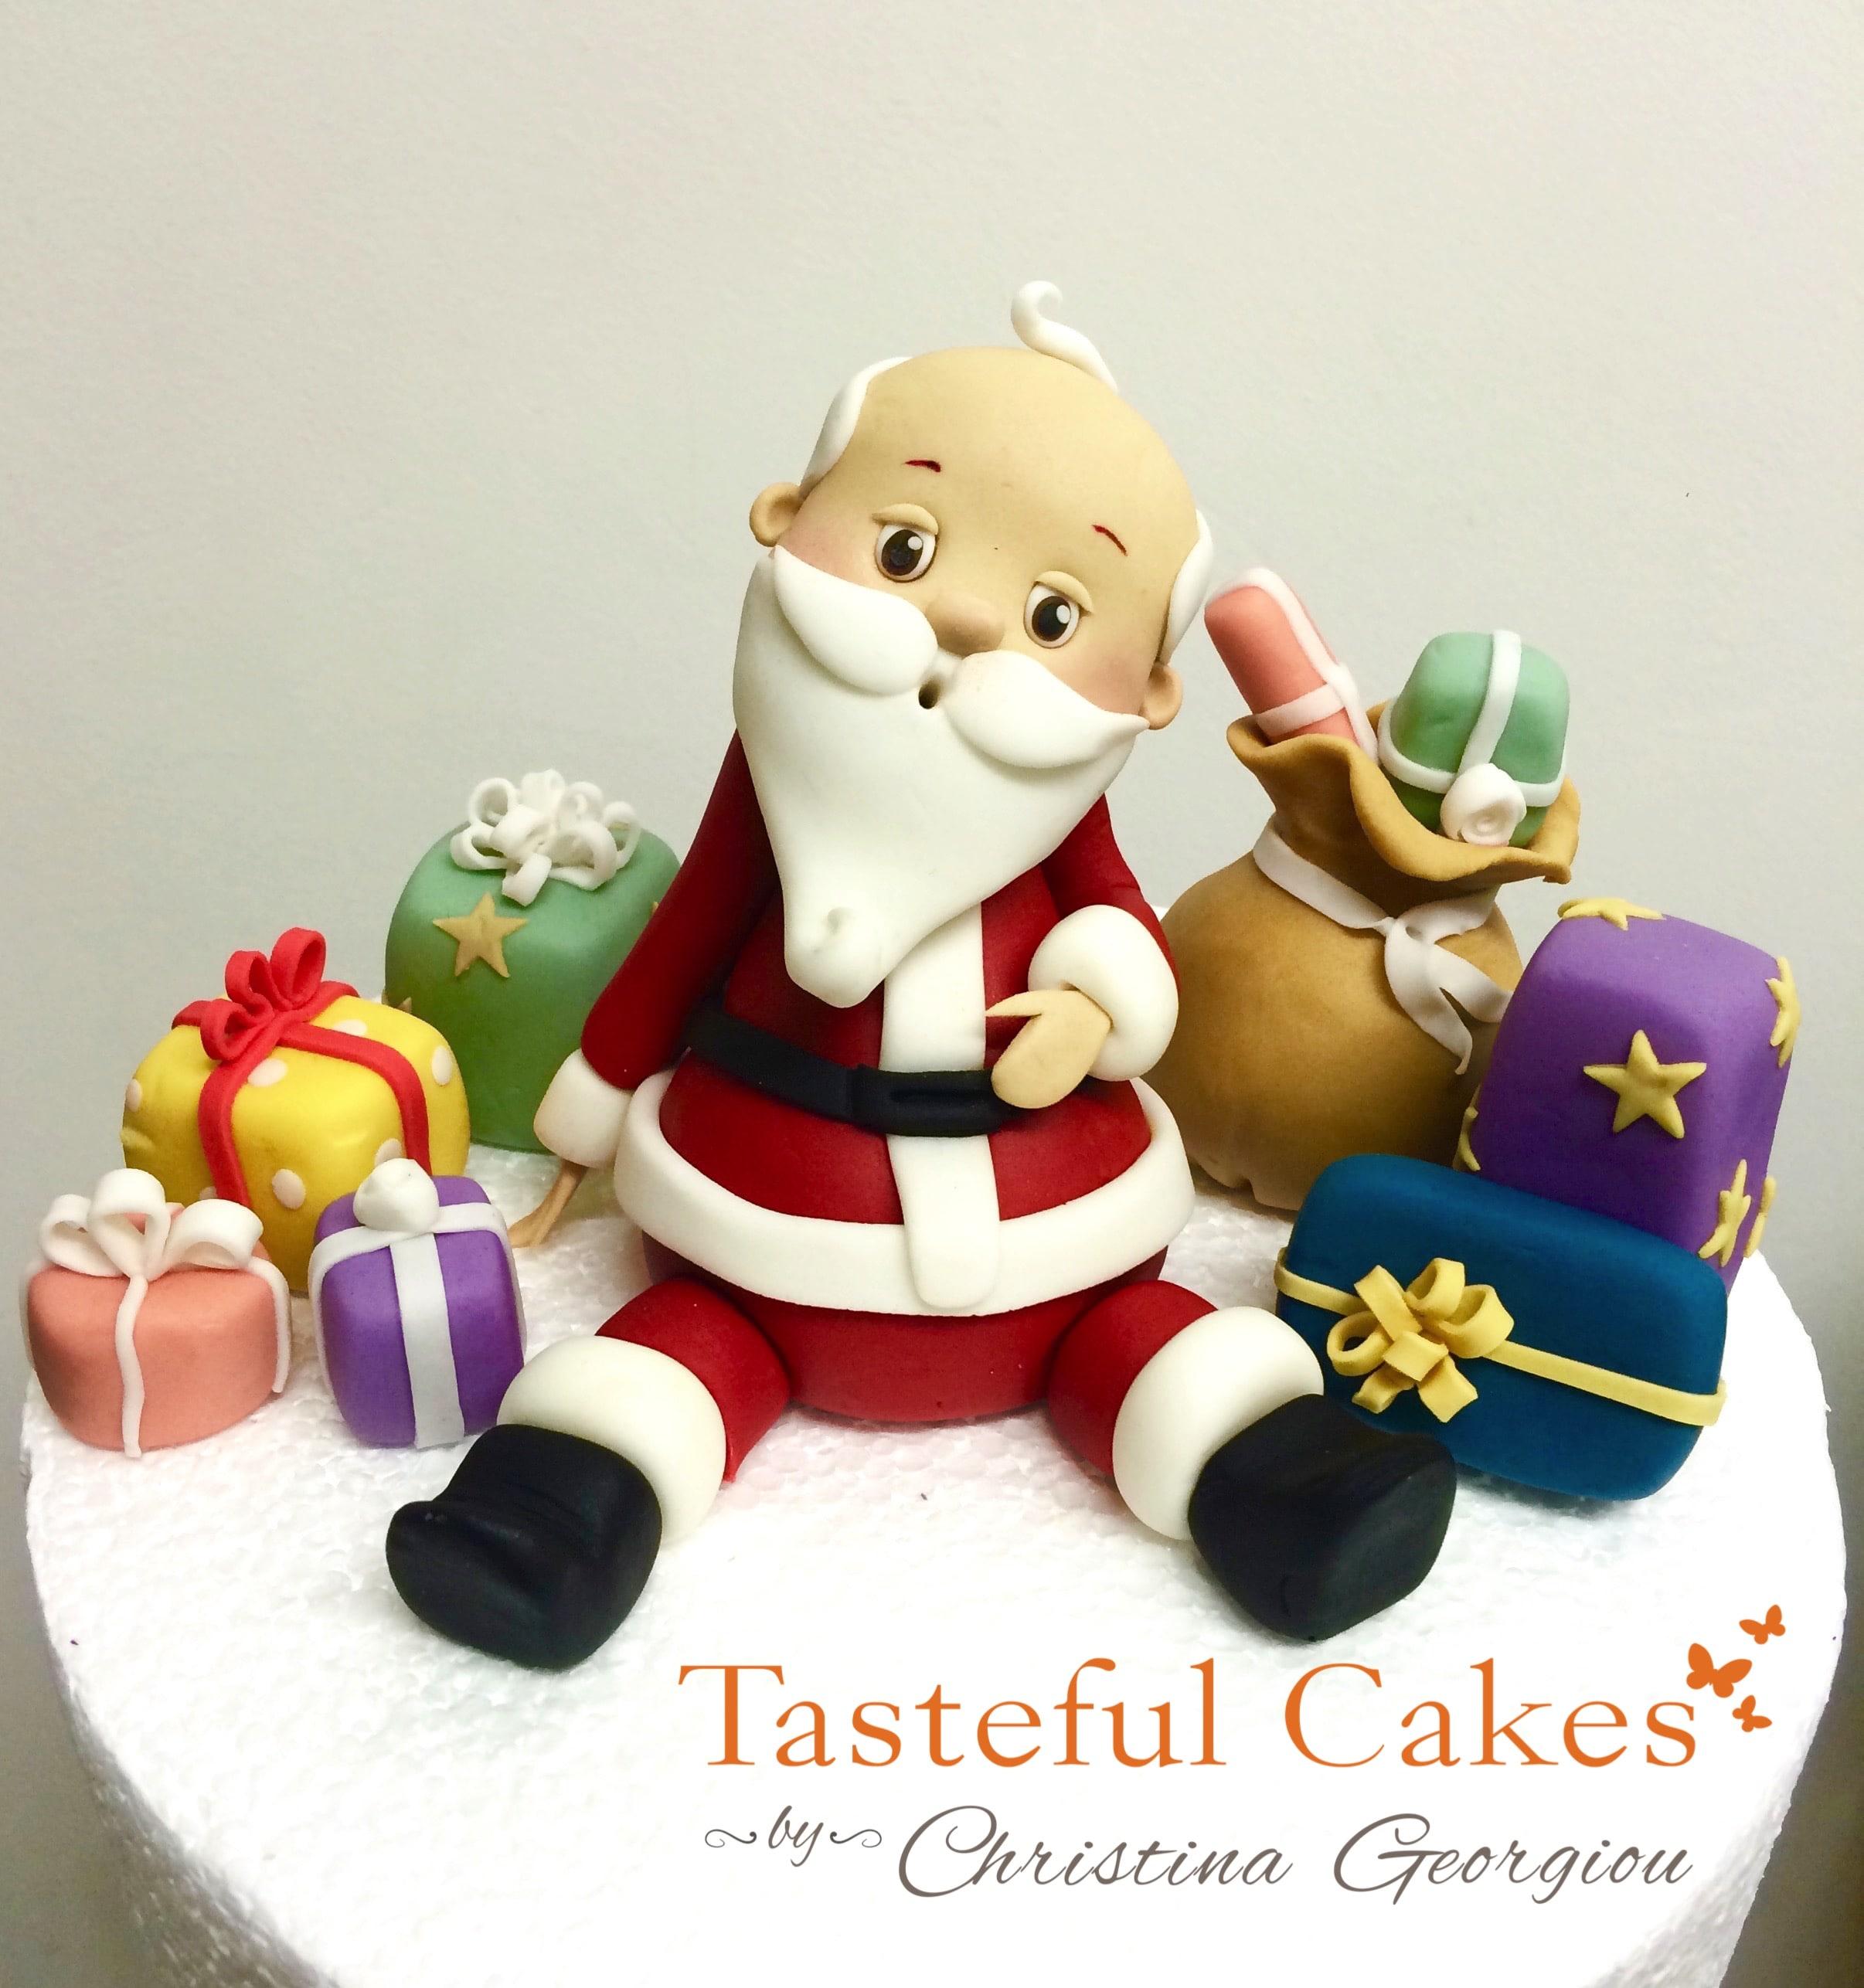 Tasteful Cakes By Christina Georgiou Tasteful Cakes ...